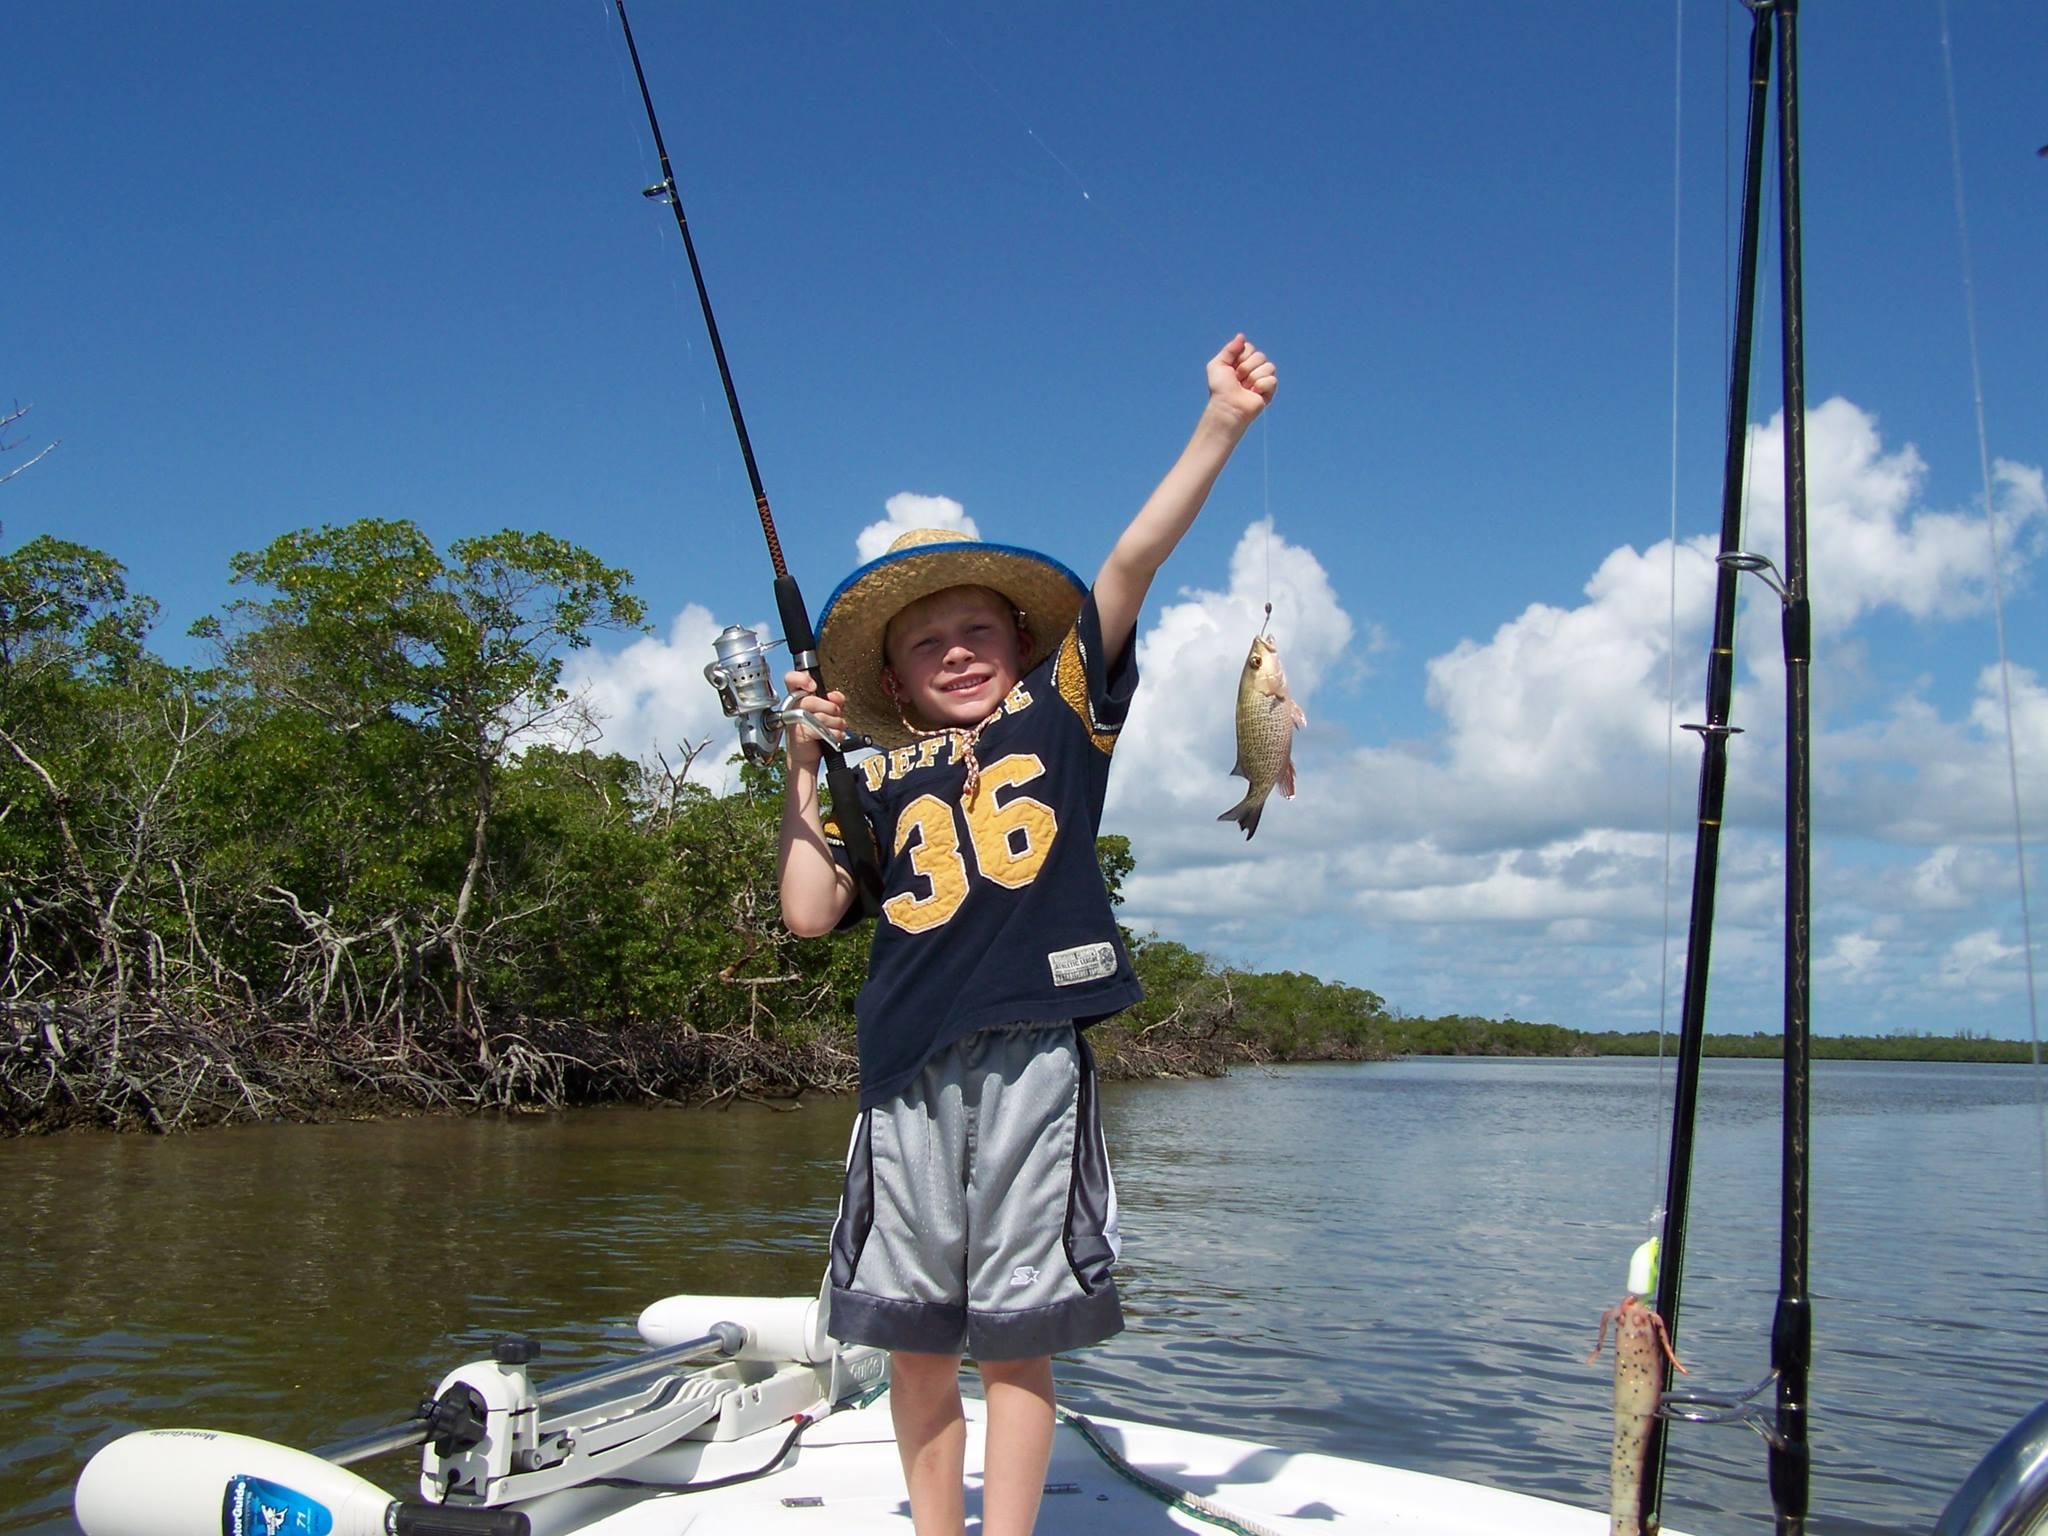 Outgoing charters chokoloskee everglades fl fishing guide for Everglades fishing guide